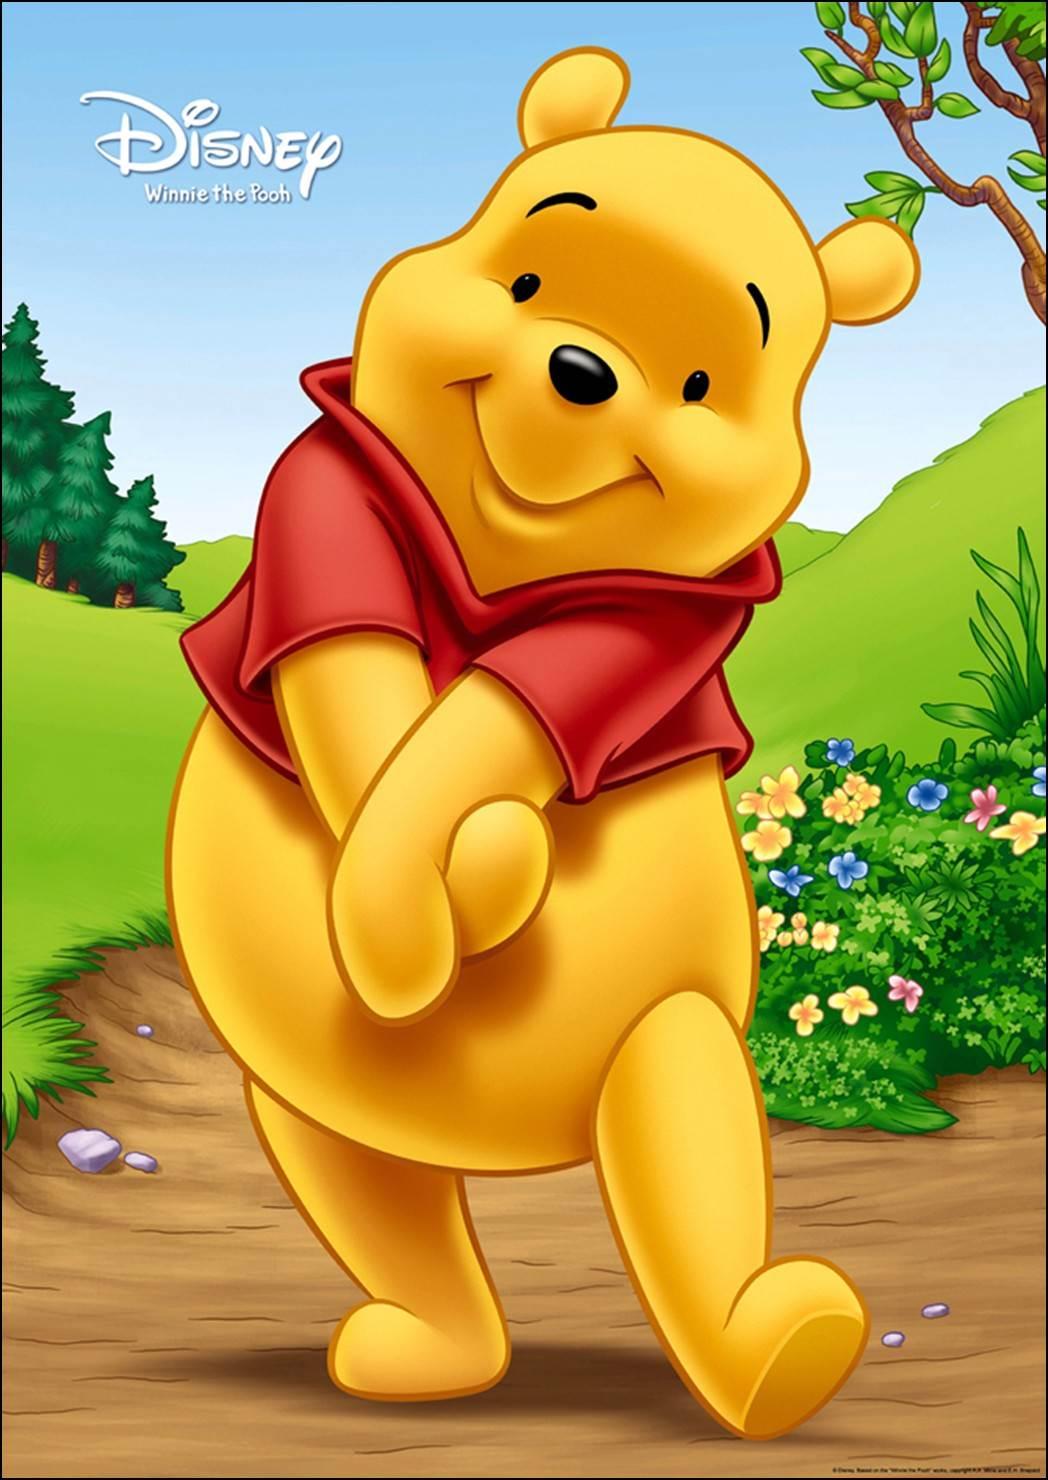 Winnie the pooh wallpaper best wallpaper collection 1048x1480 voltagebd Choice Image